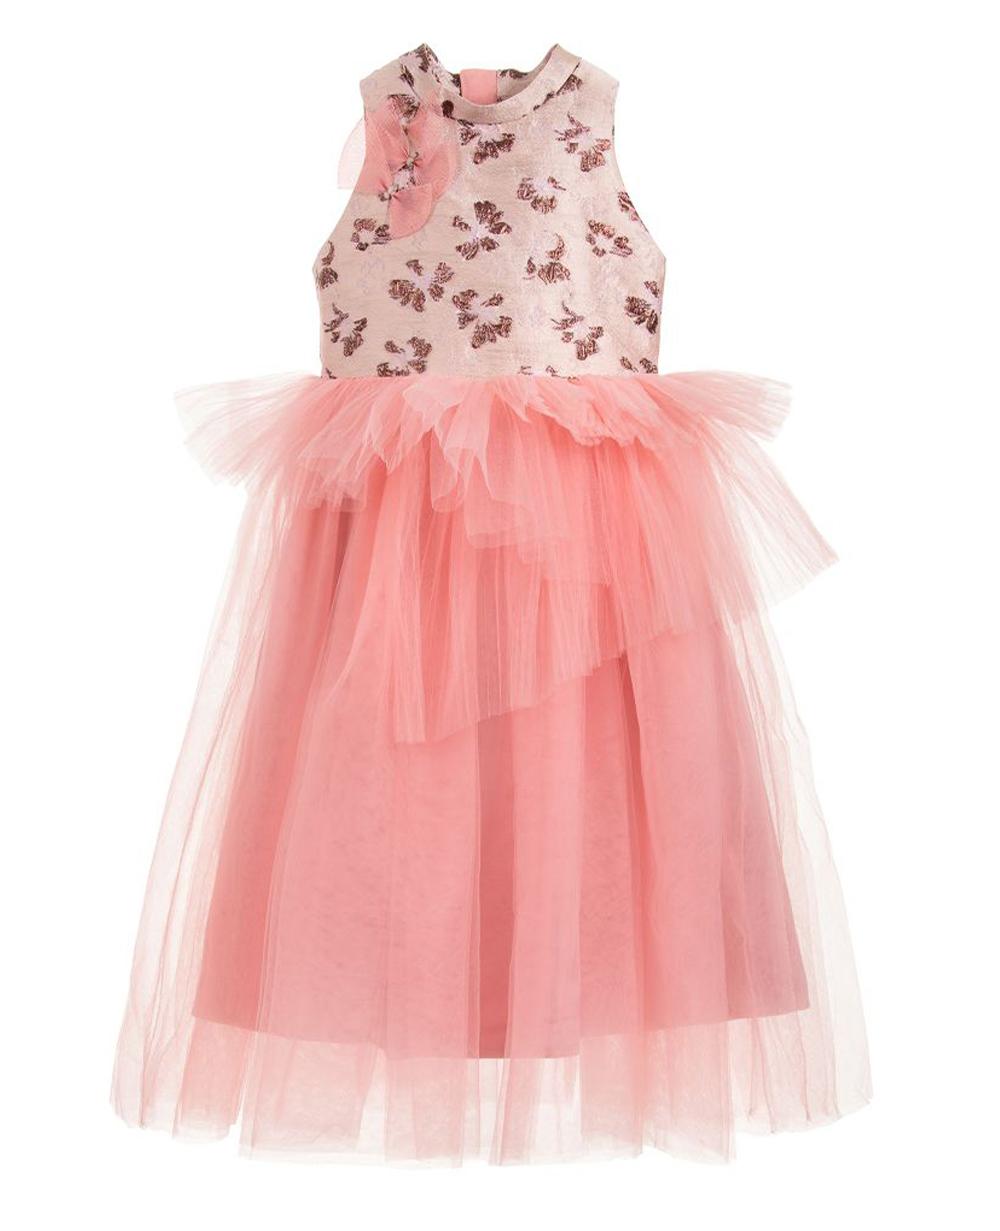 Pink Tulle Princess Dress Tulle Skirt Floral Dress